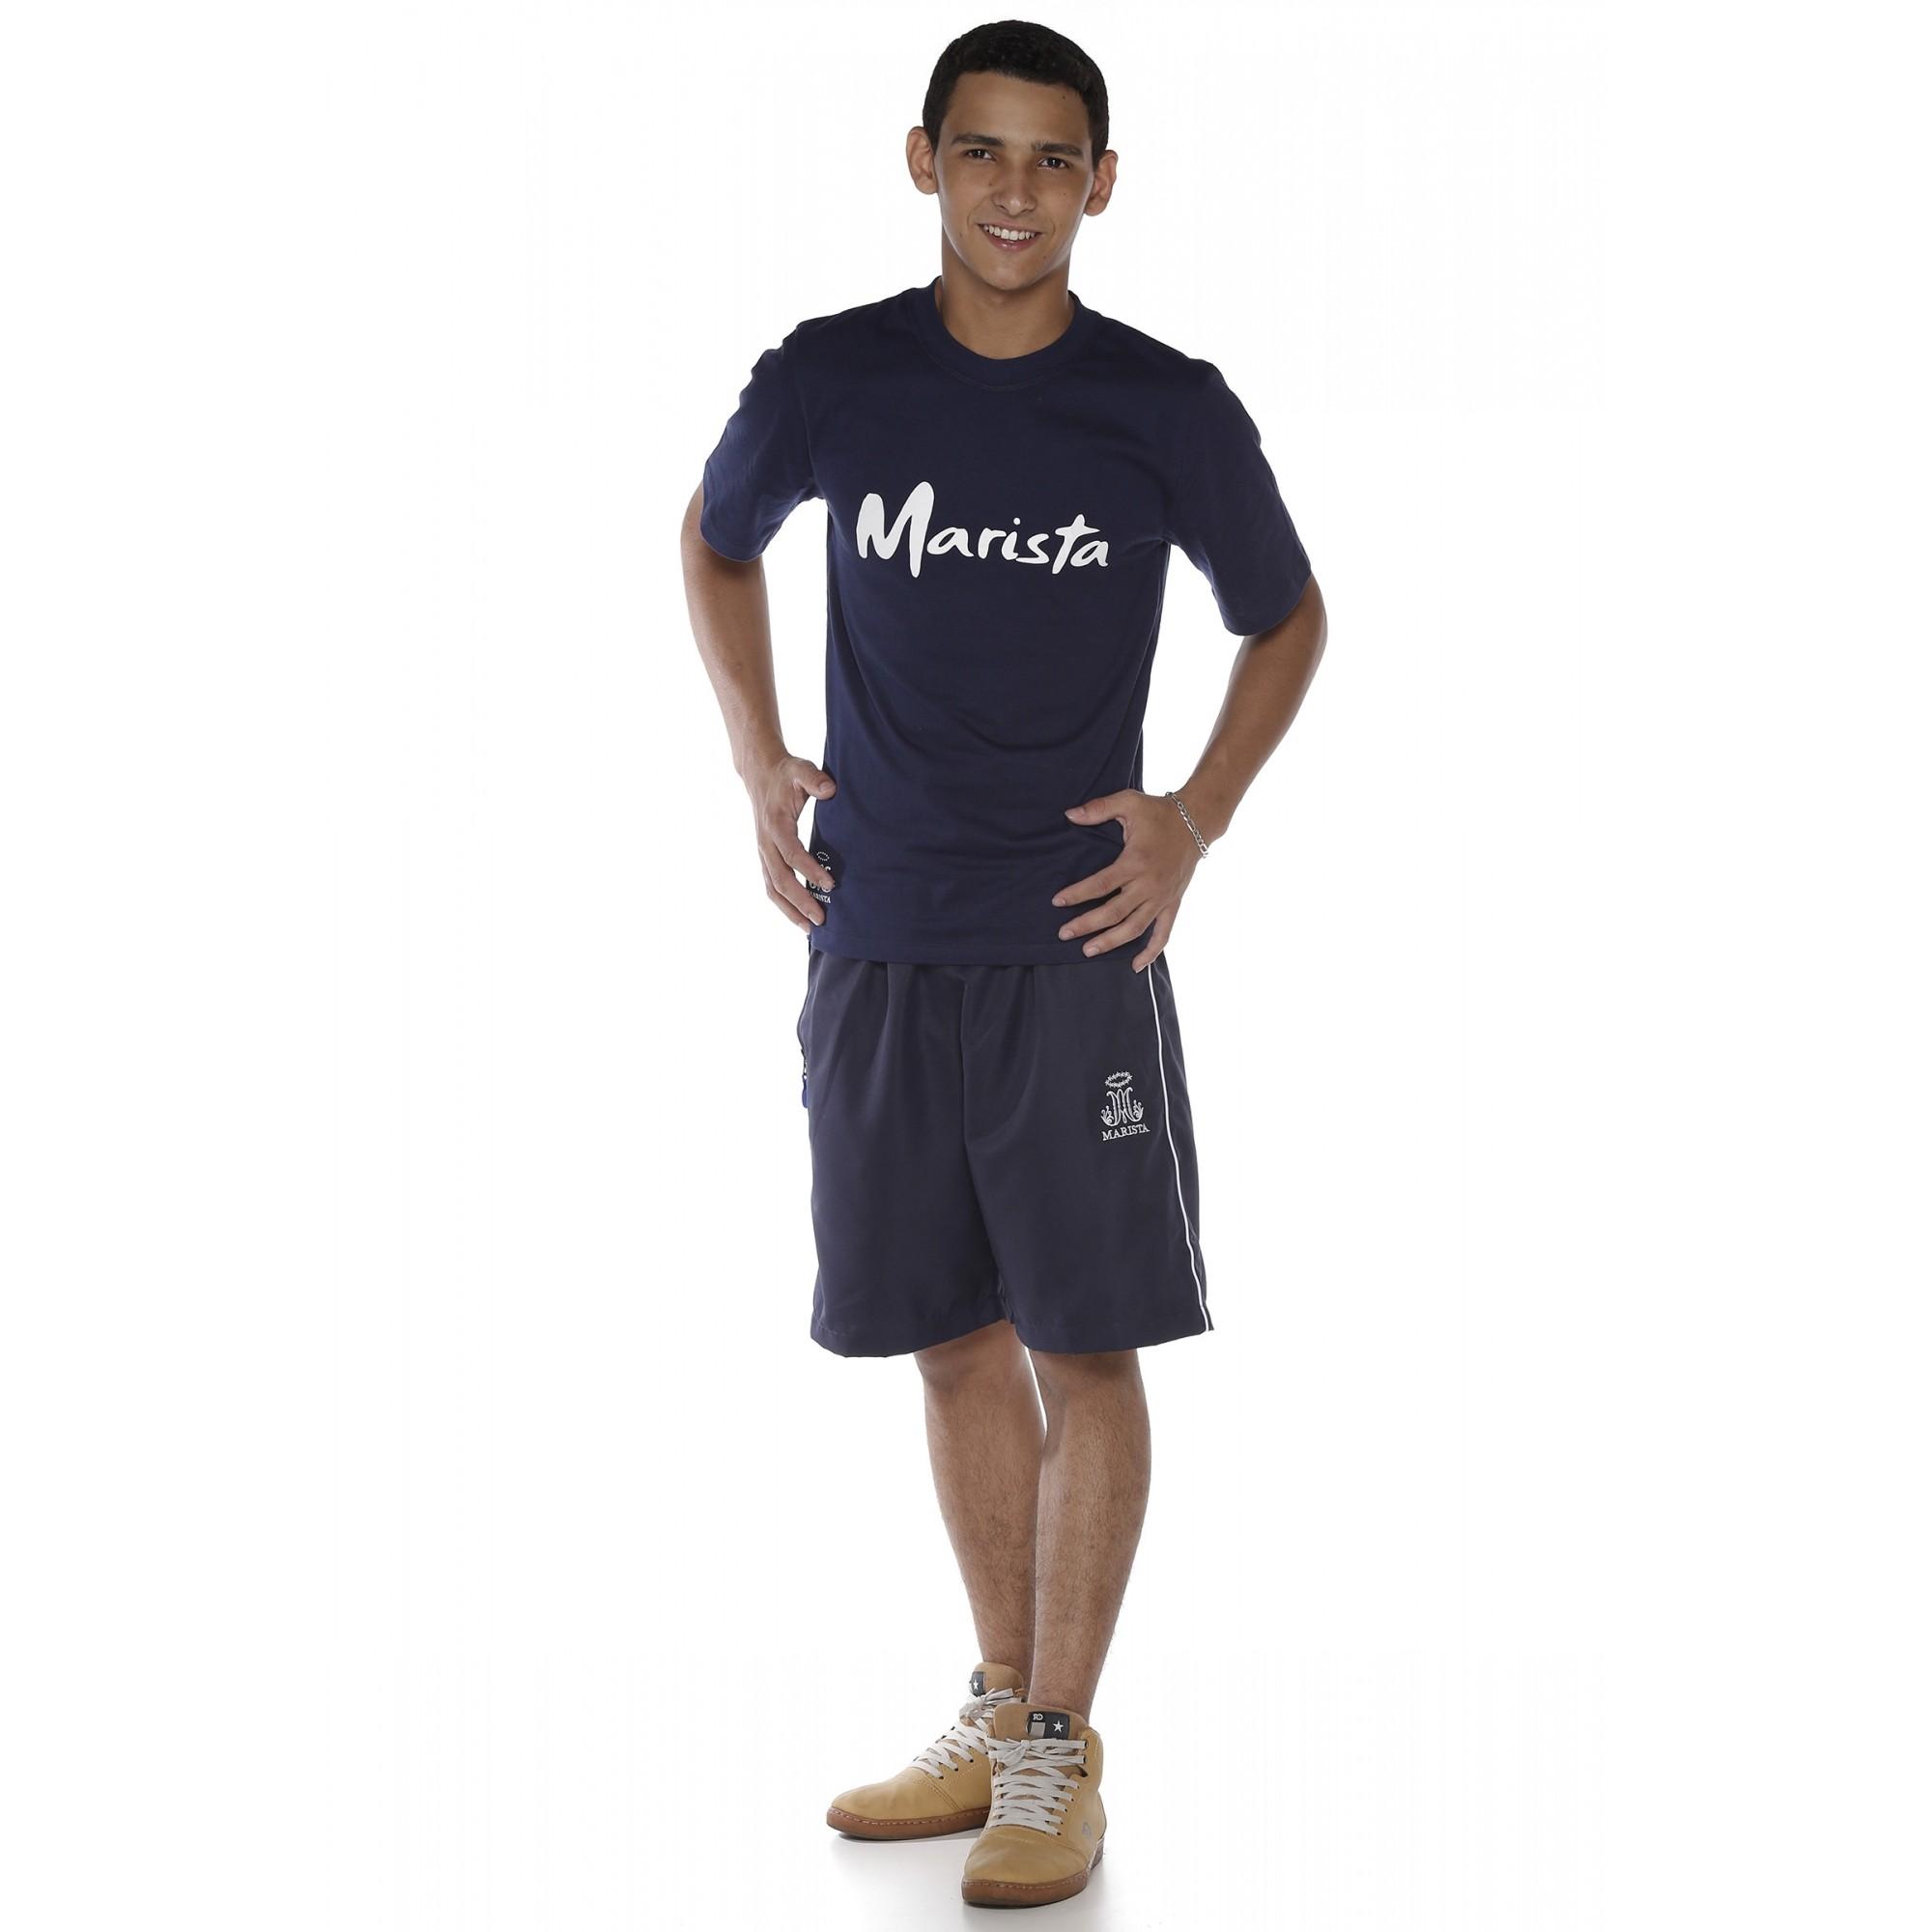 Camiseta Manga Curta Masculina Marinho Malha Algodão - Colégio Marista